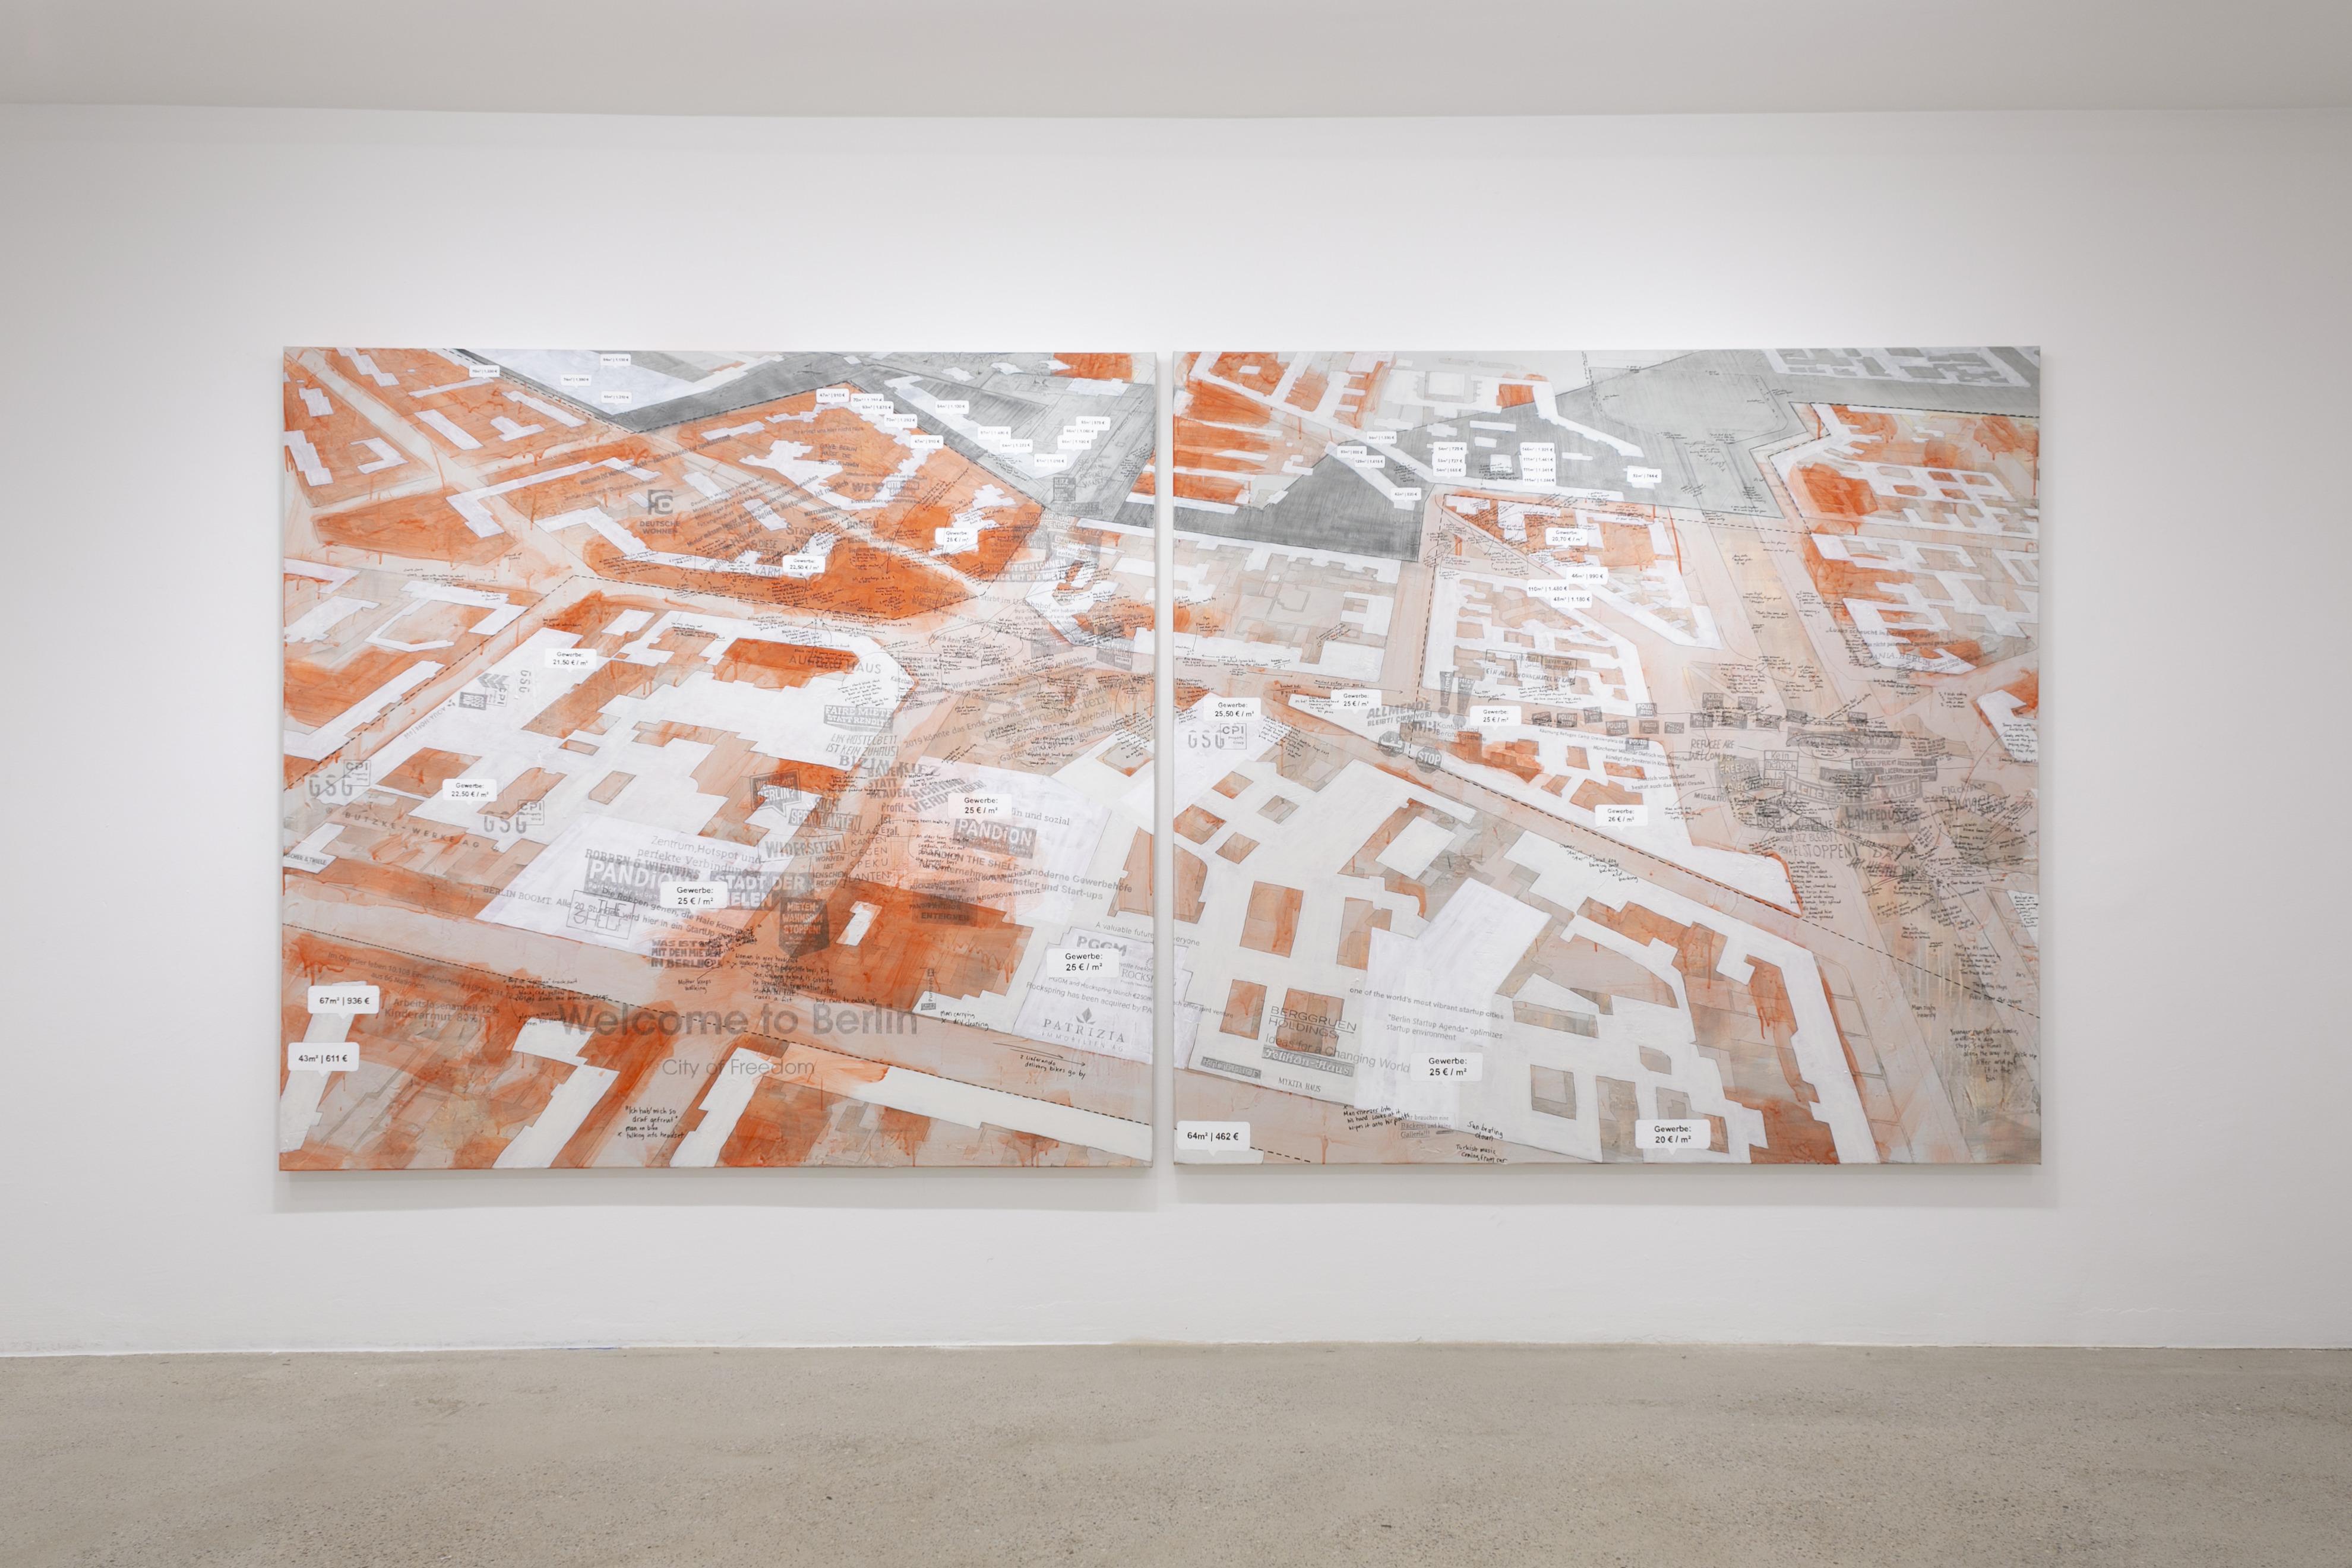 <p>Larissa Fassler at SMAC, Linienstr. 57, 10119 Berlin; photo: Anastasia Muna</p>